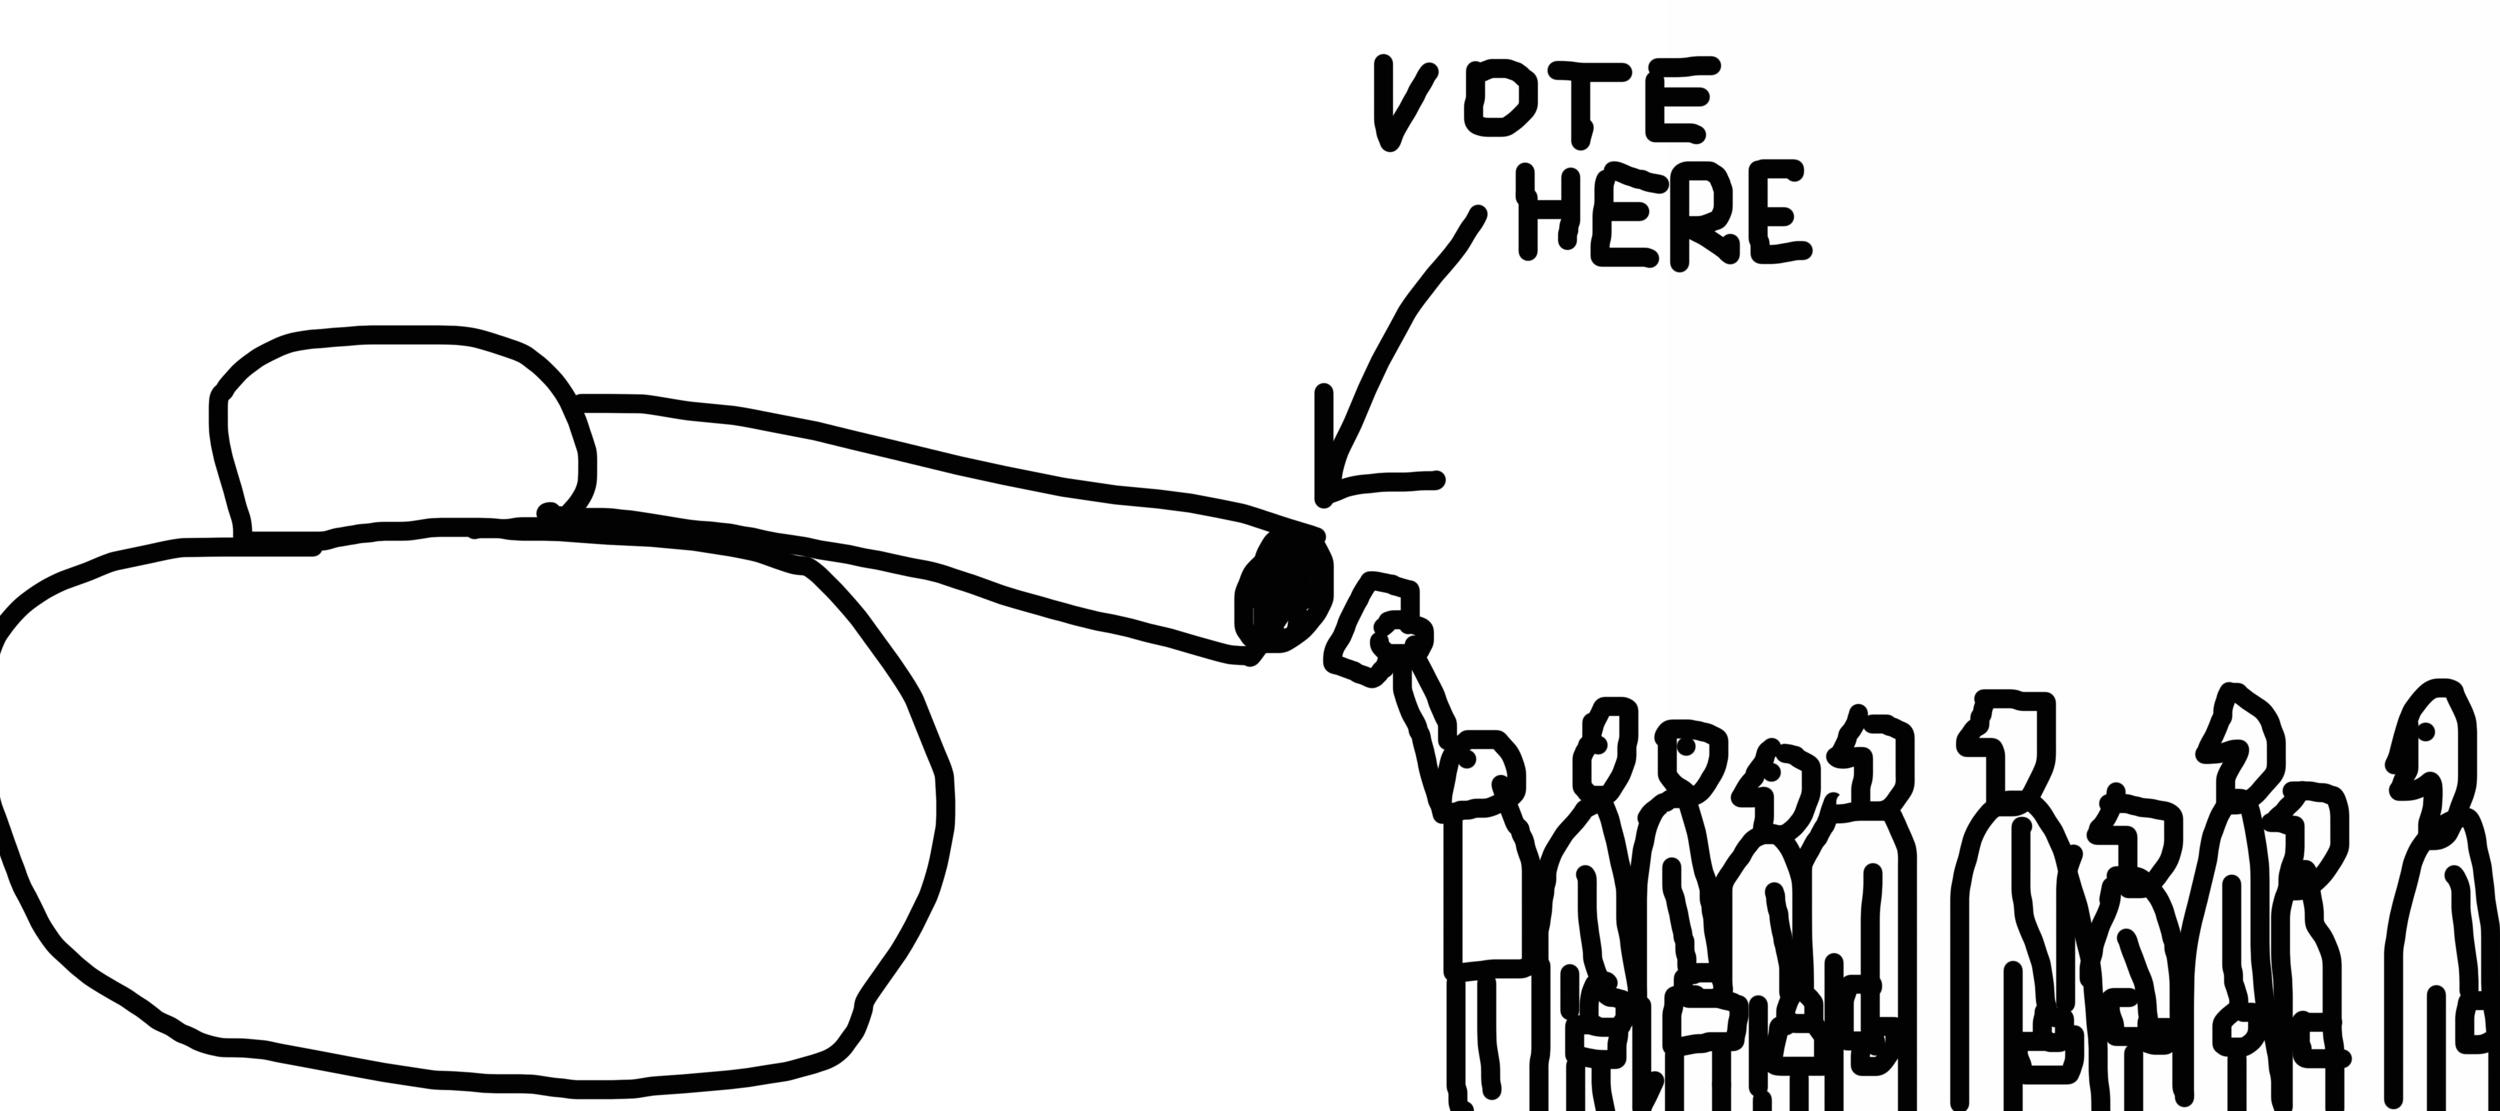 crimea 6 referendum.jpg